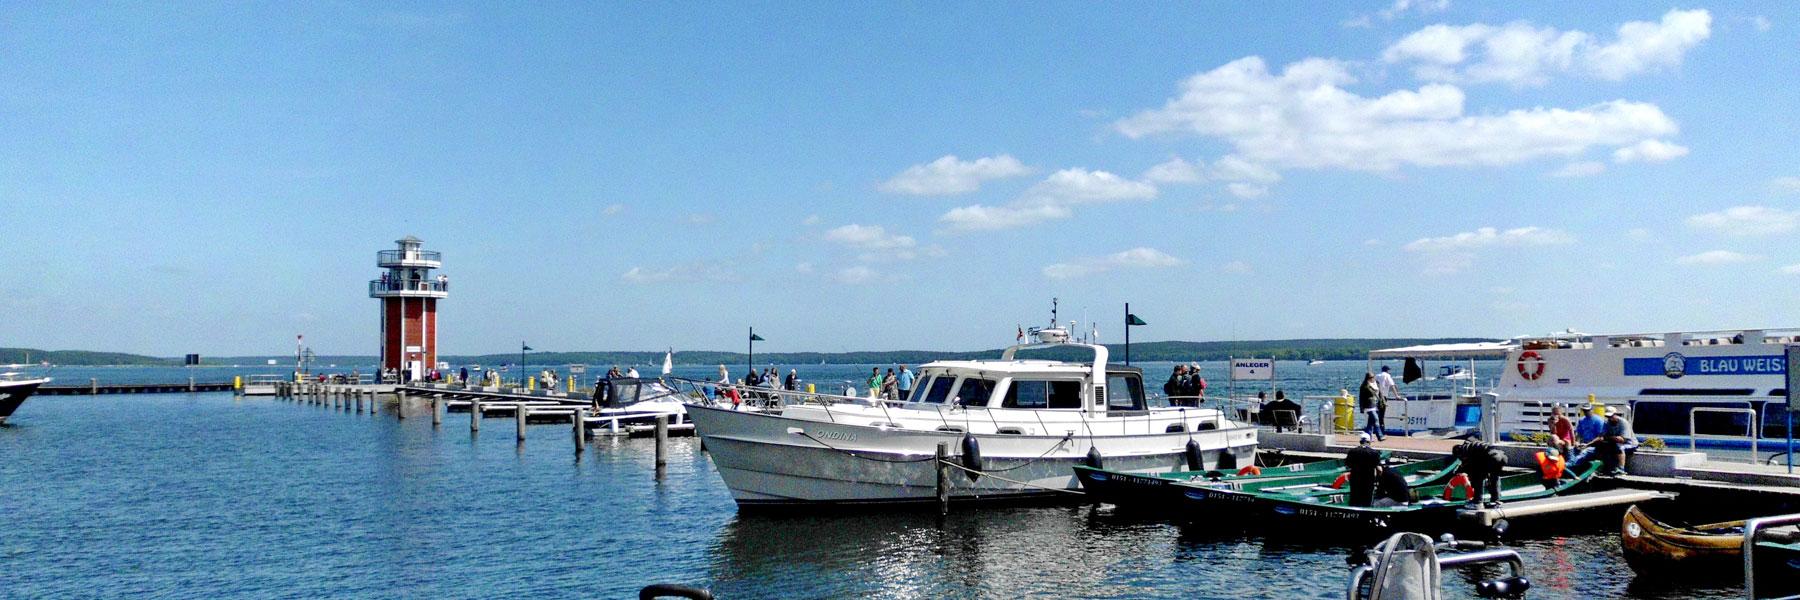 Hafen Plau - Ferienhaus Caroline